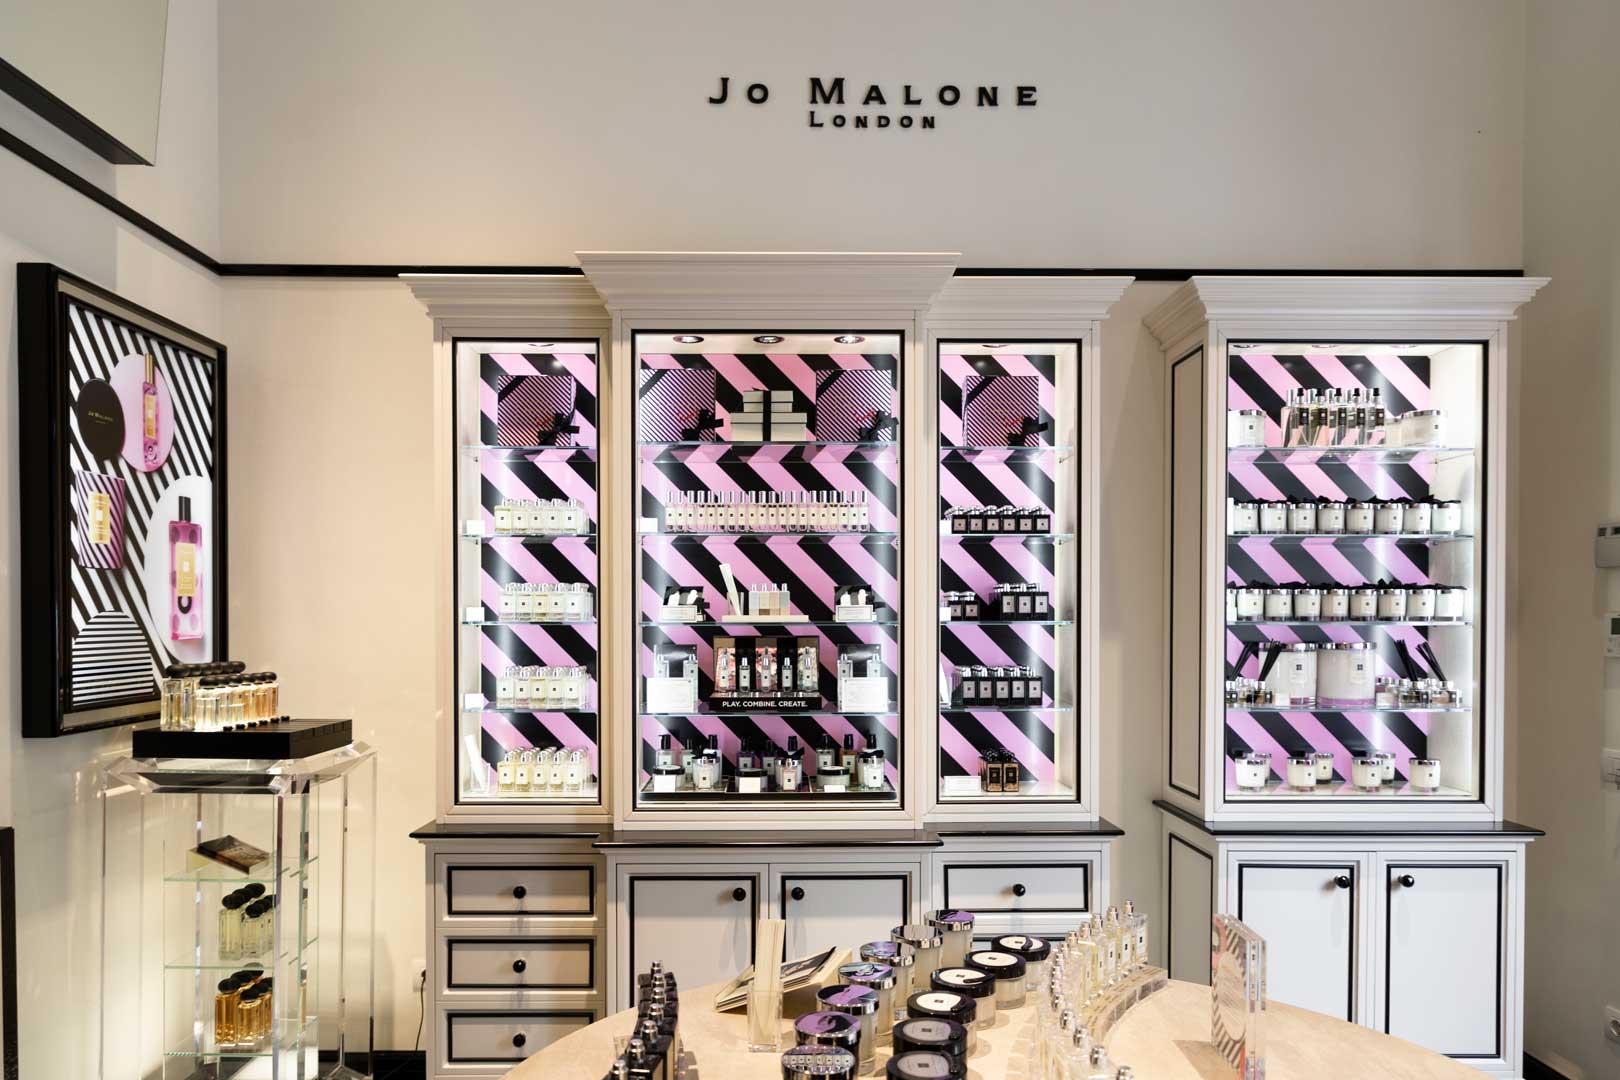 Jo Malone Poppy Delevingne - Milano